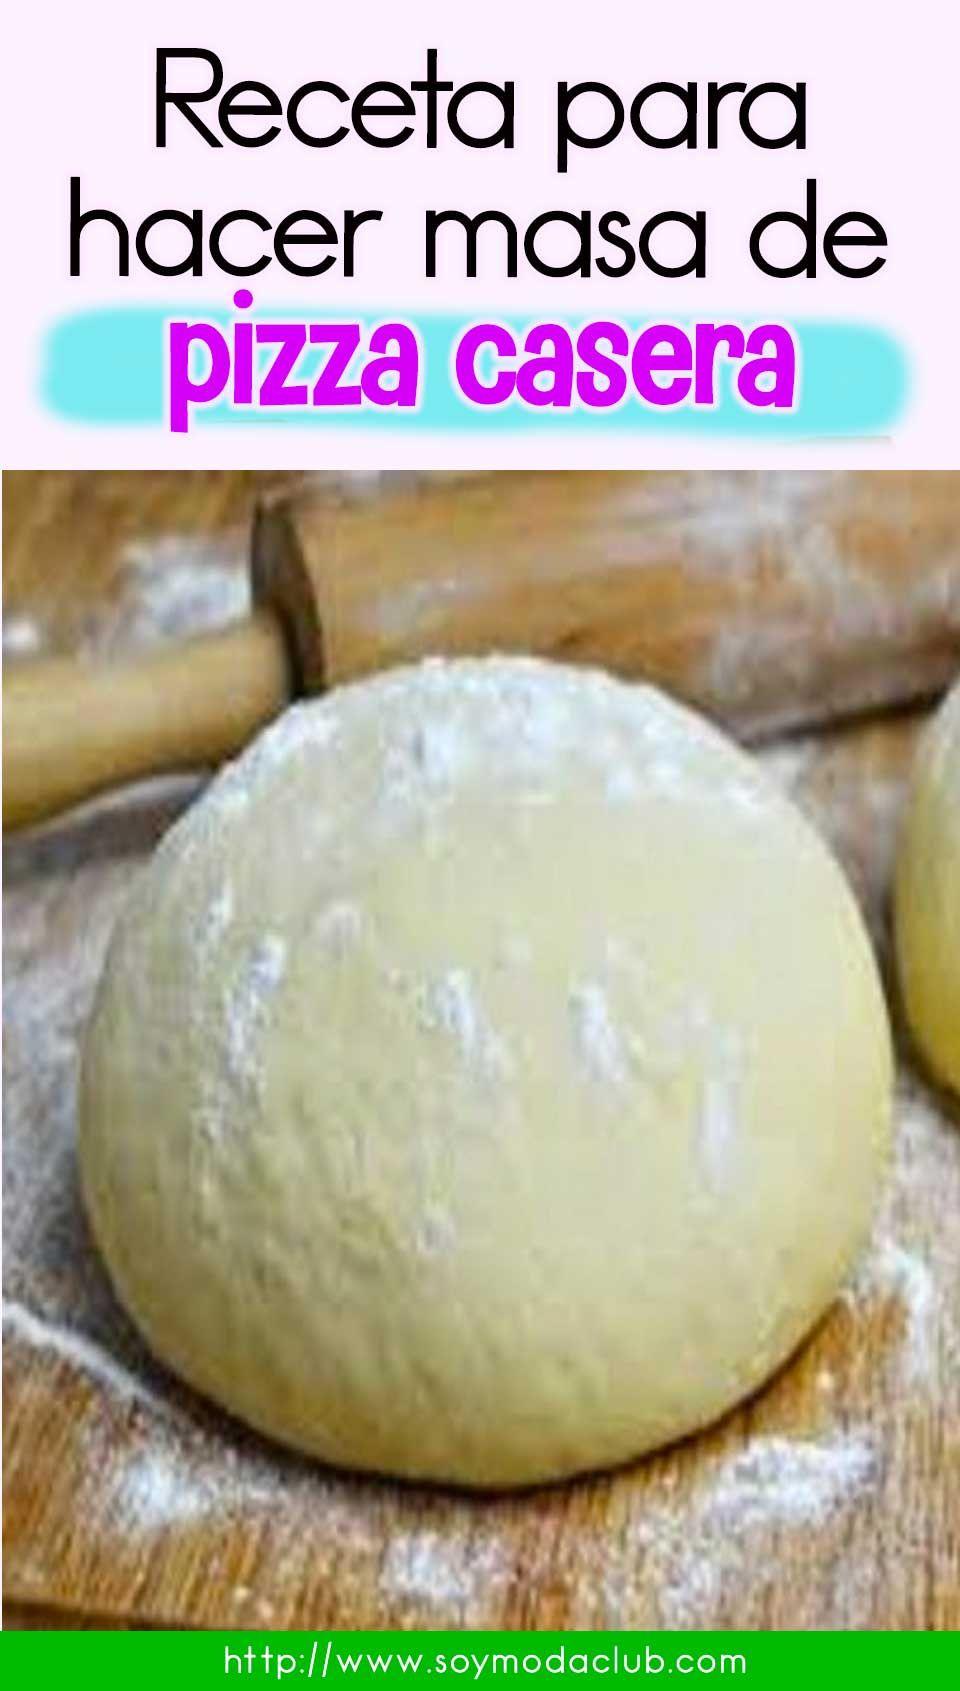 Receta Para Hacer Masa De Pizza Casera Food Shortcrust Pastry Calzone Pizza